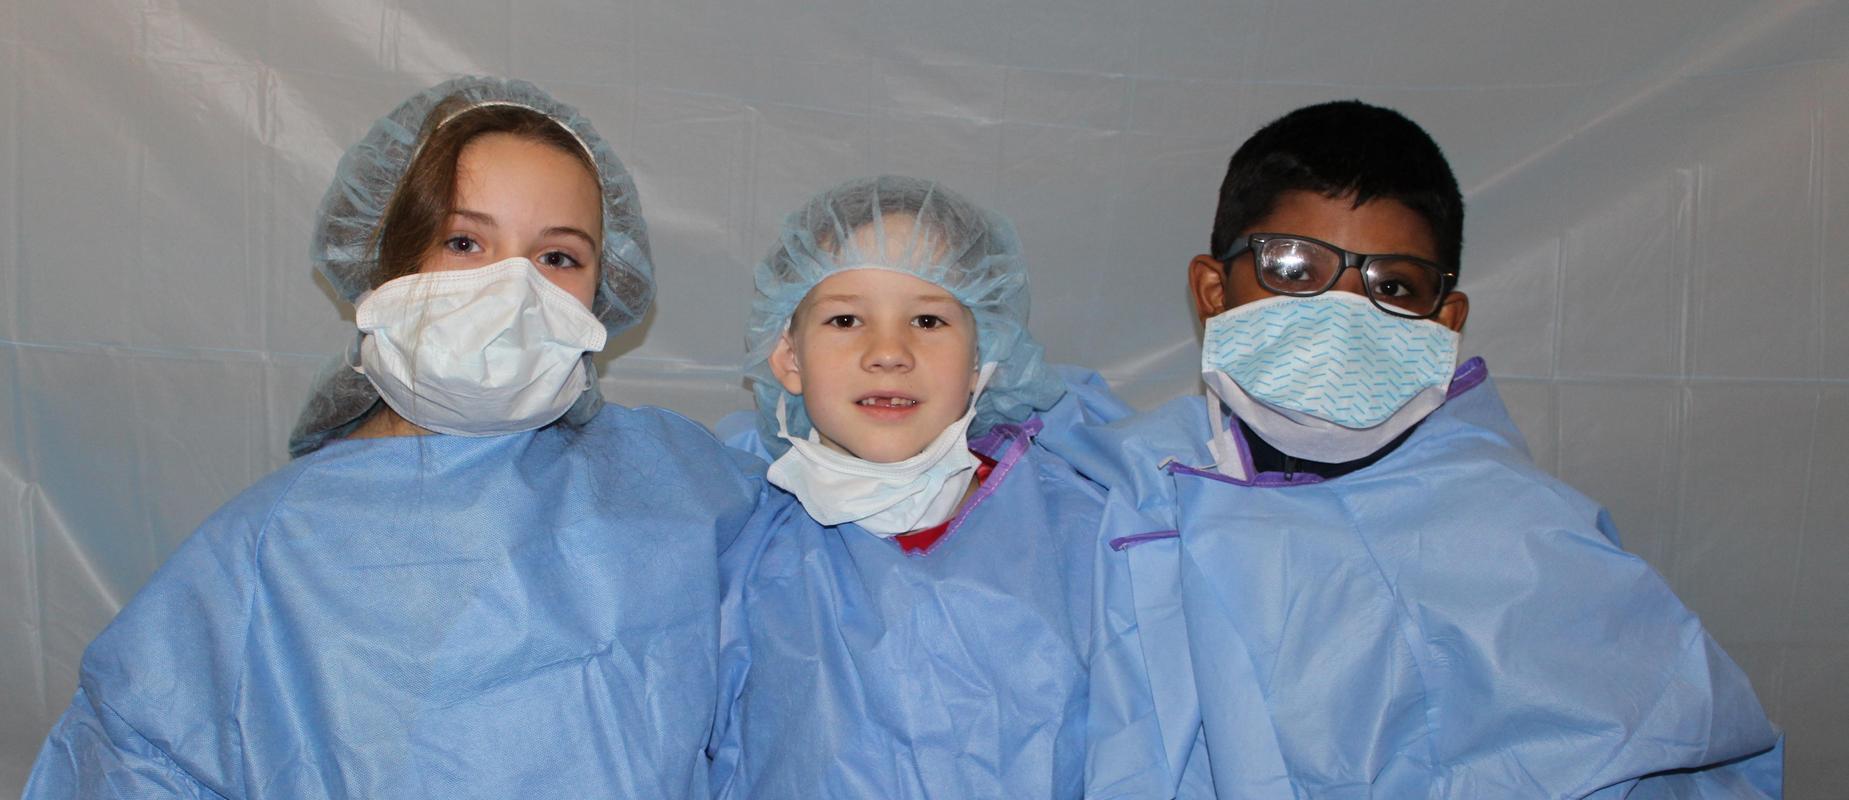 3 third graders in scrubs